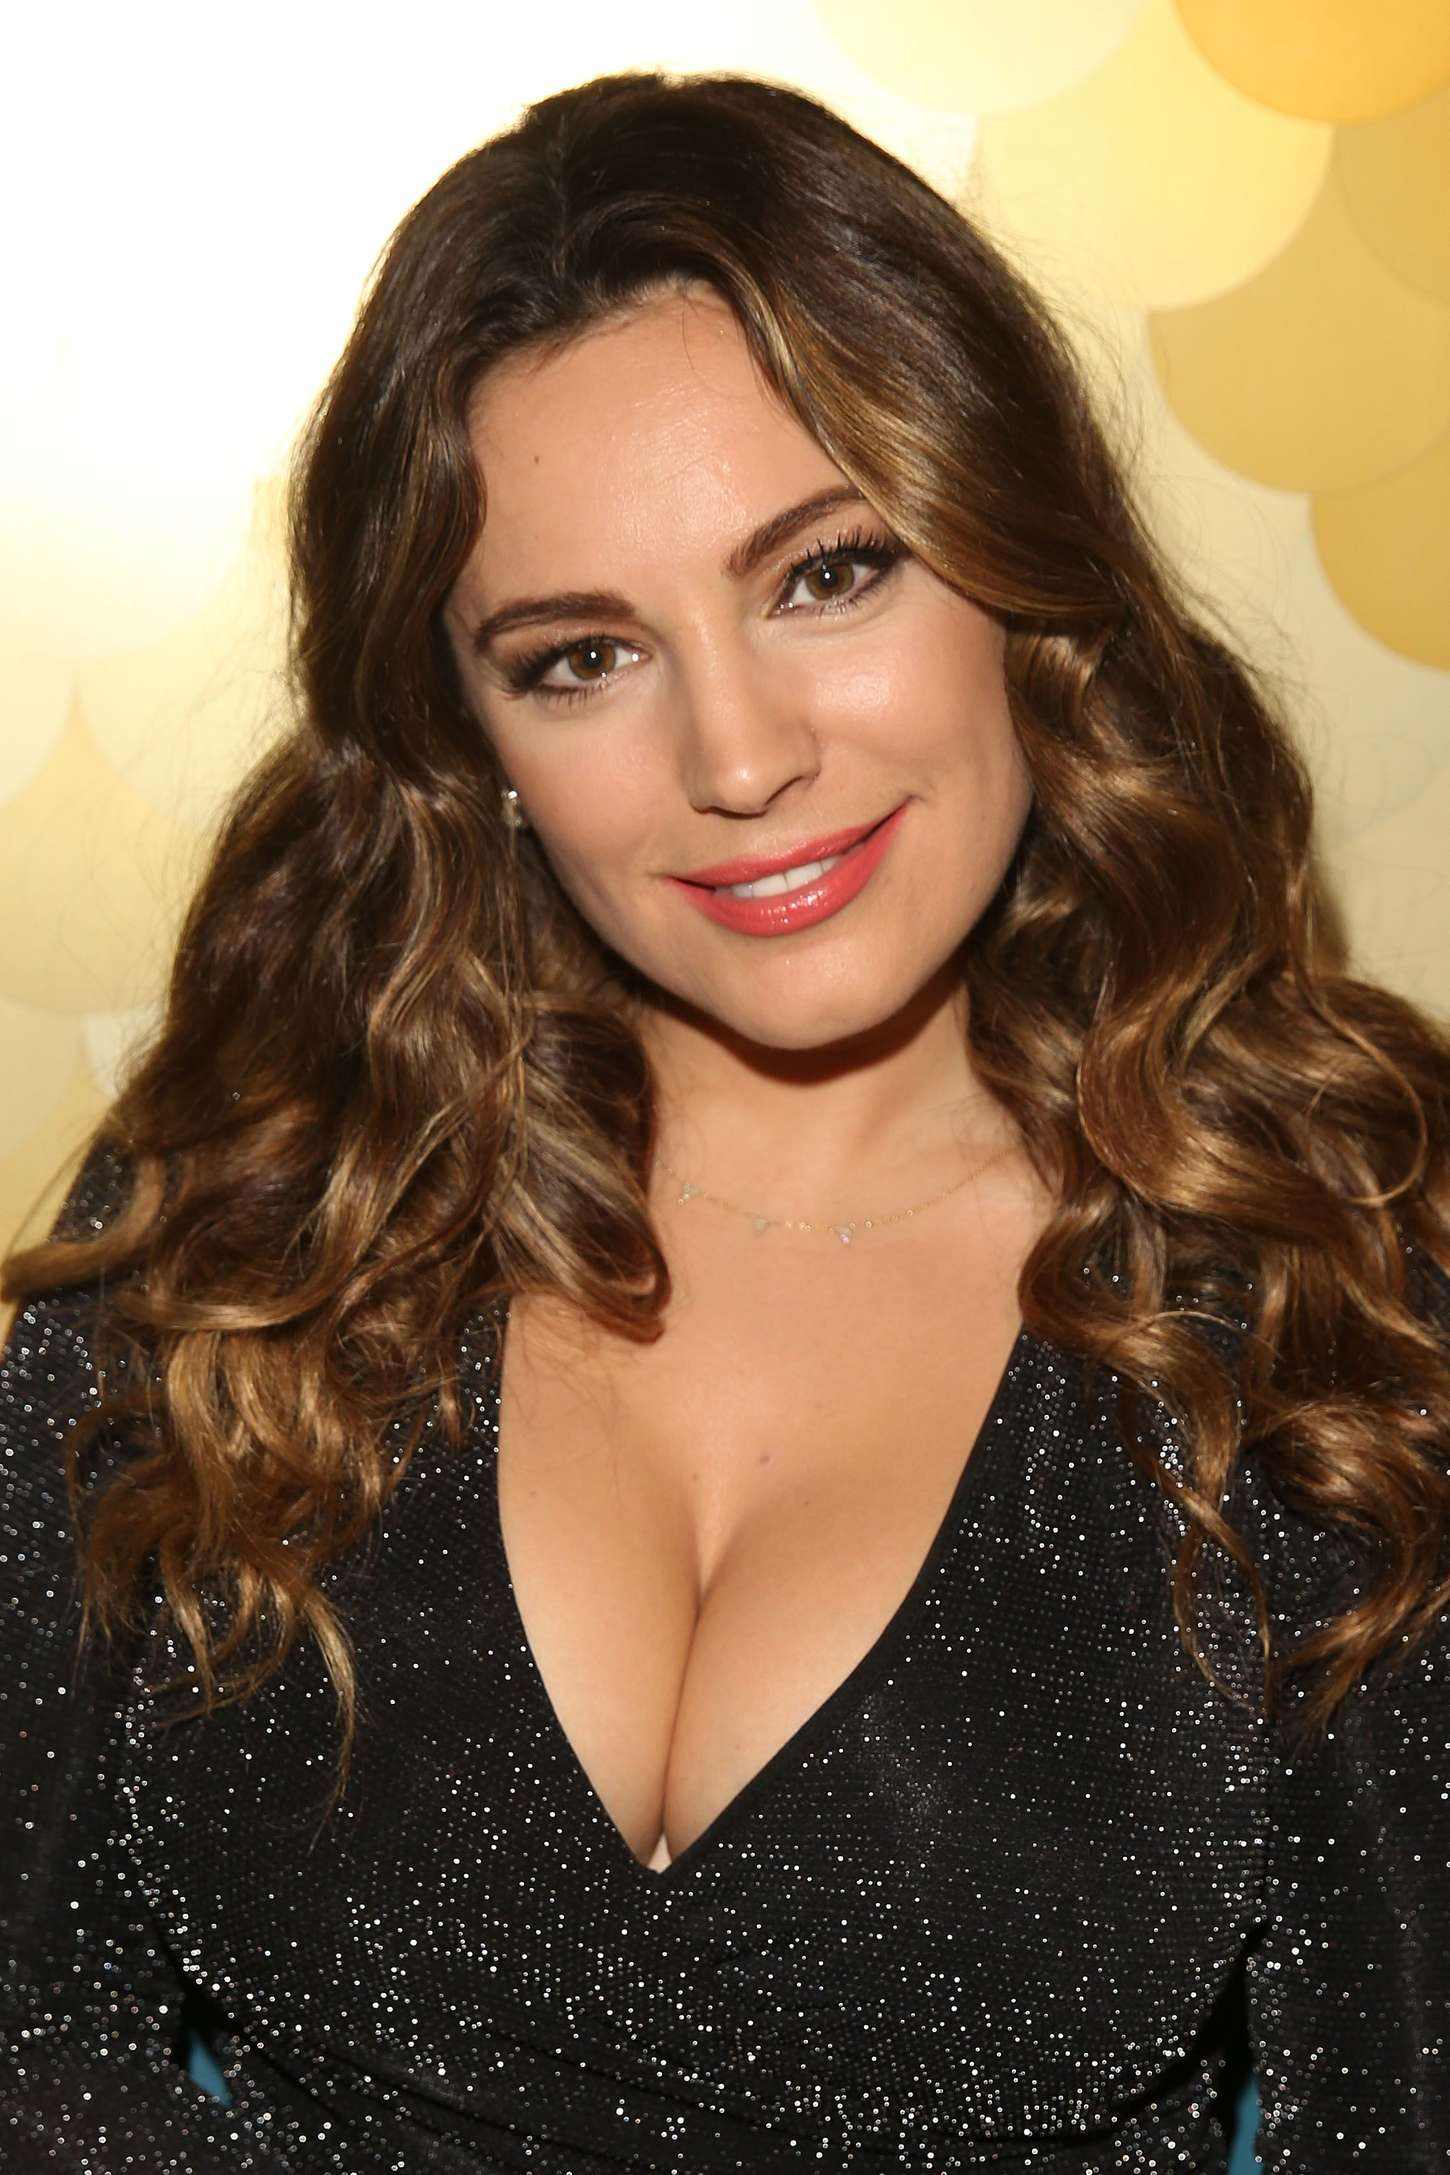 Alessandra ambrosio boobs in verdades secretas scandalplanet - 3 part 5